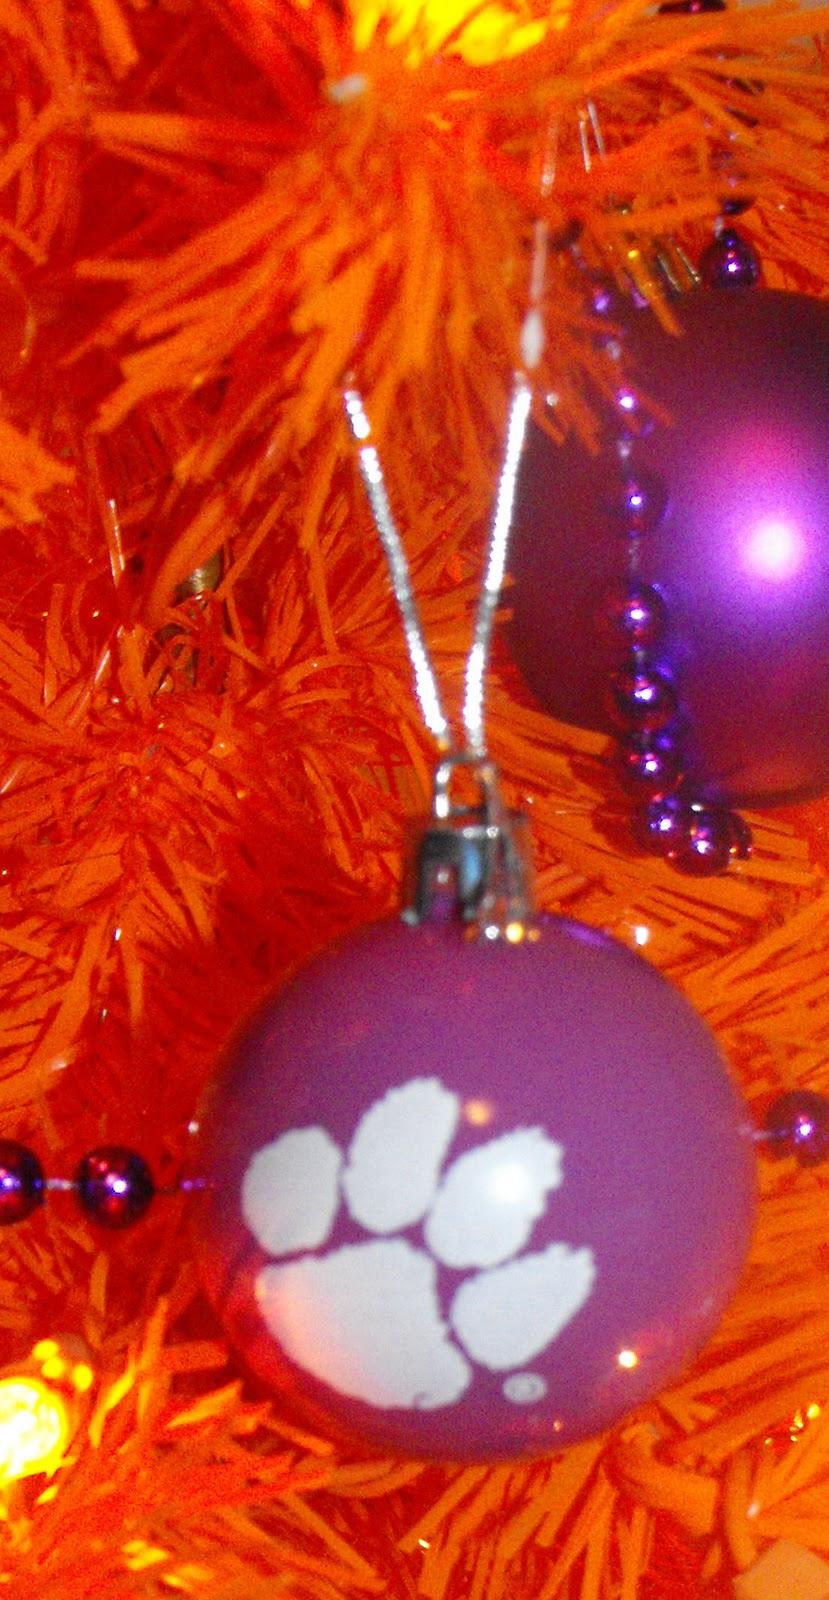 Purple Tiger Stargazer Nail Art Designs By Top Nails: Coley's Corner: Noah's Clemson Tree